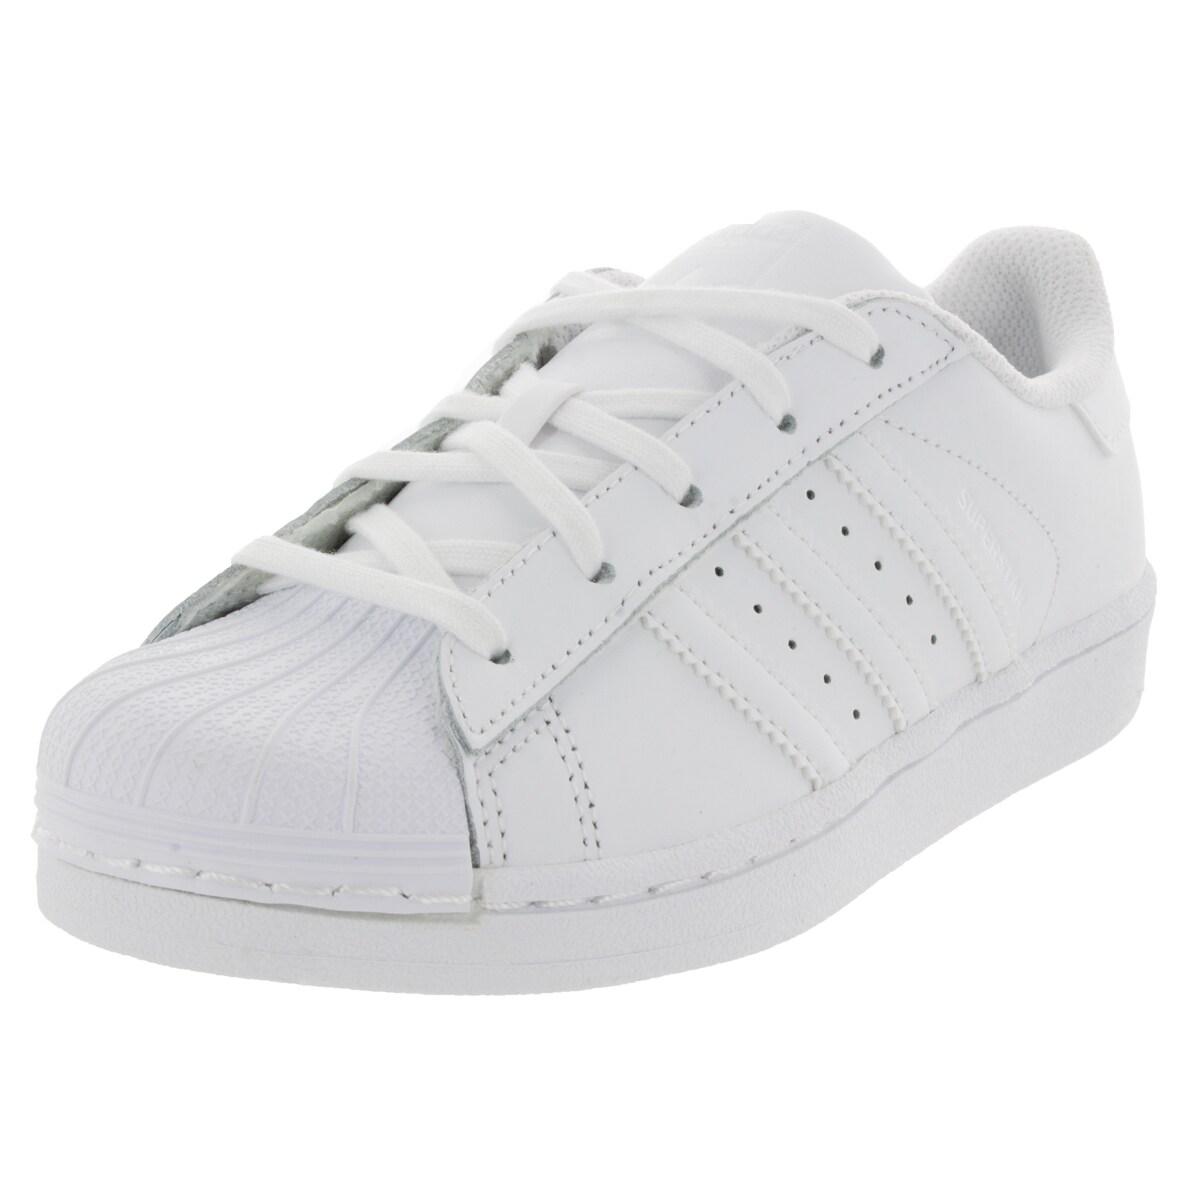 9801999c97bc Shop Adidas Kid s Superstar Foundation C Originals White White White  Basketball Shoe - Free Shipping Today - Overstock.com - 12319722